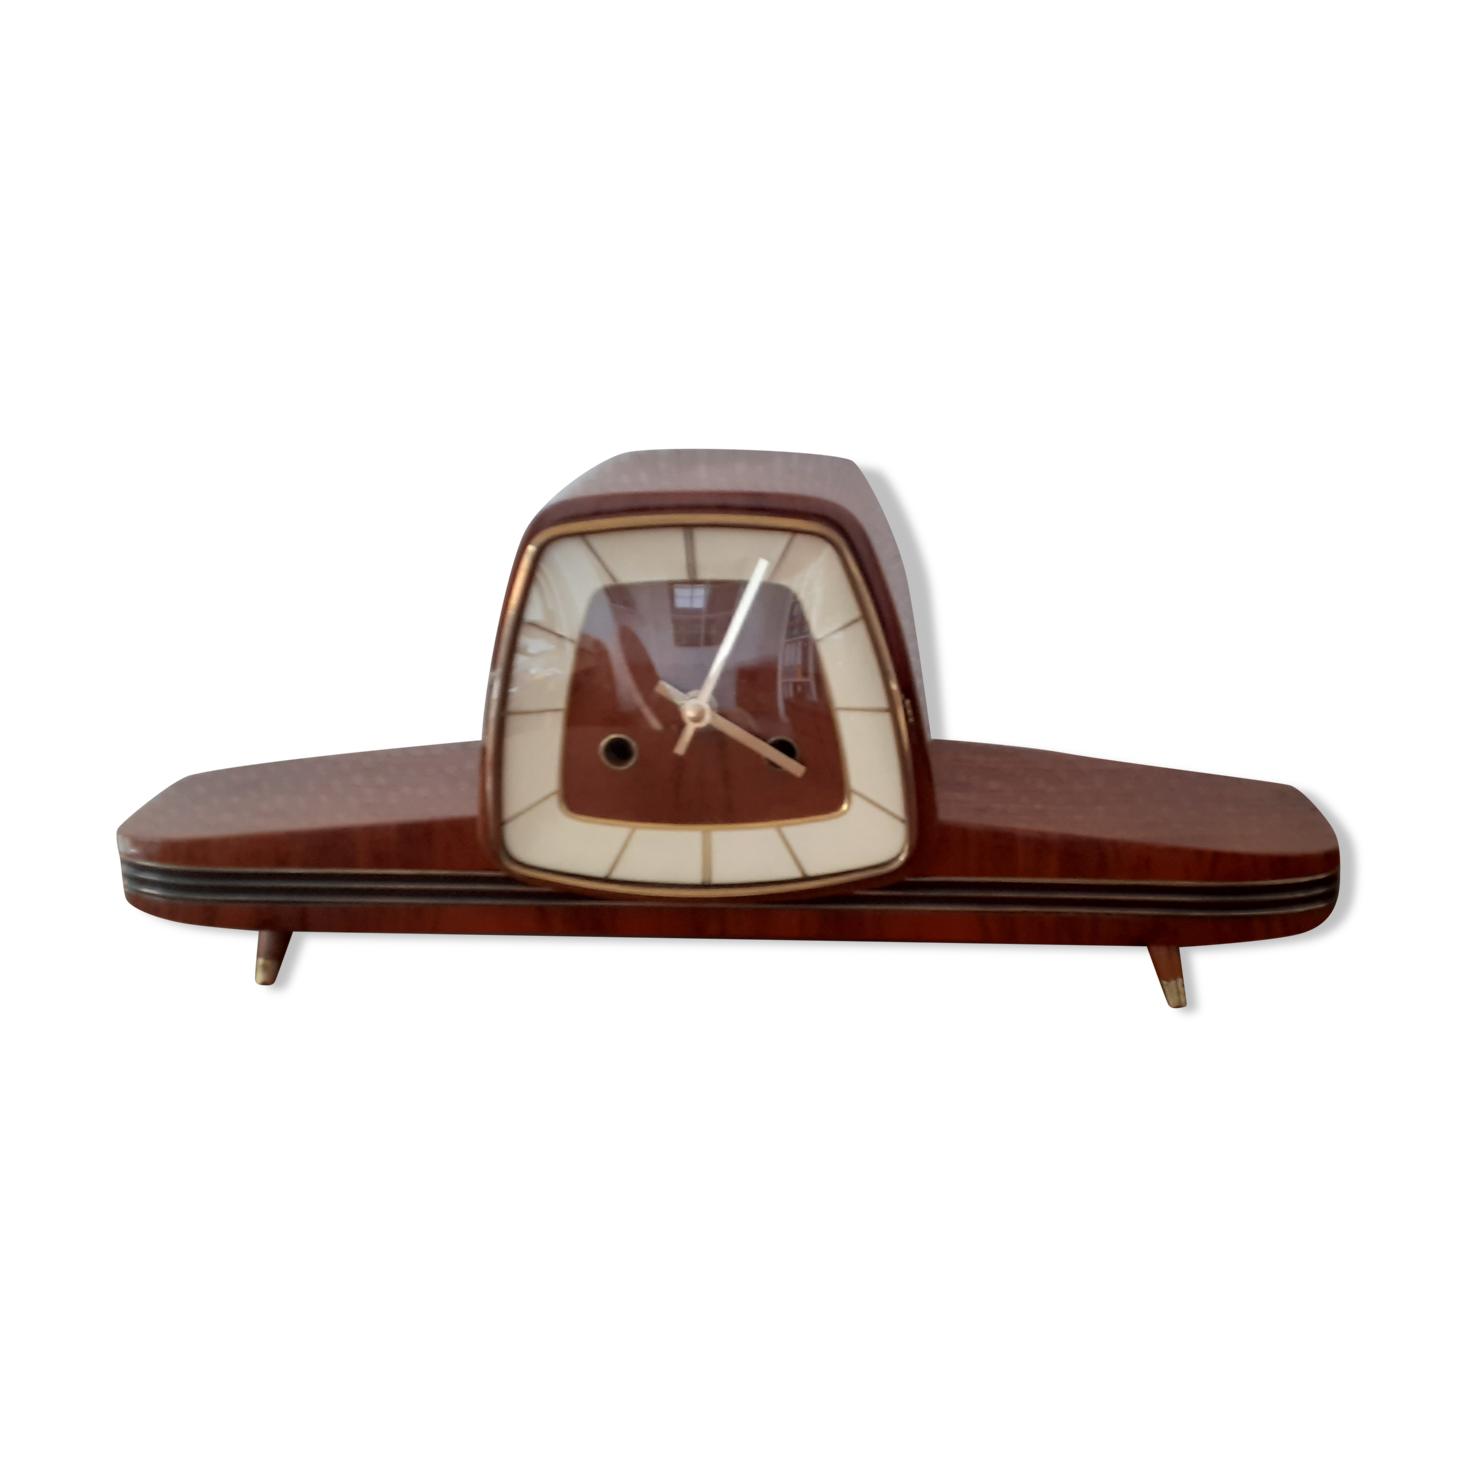 Horloge à poser Hermle années 50-60